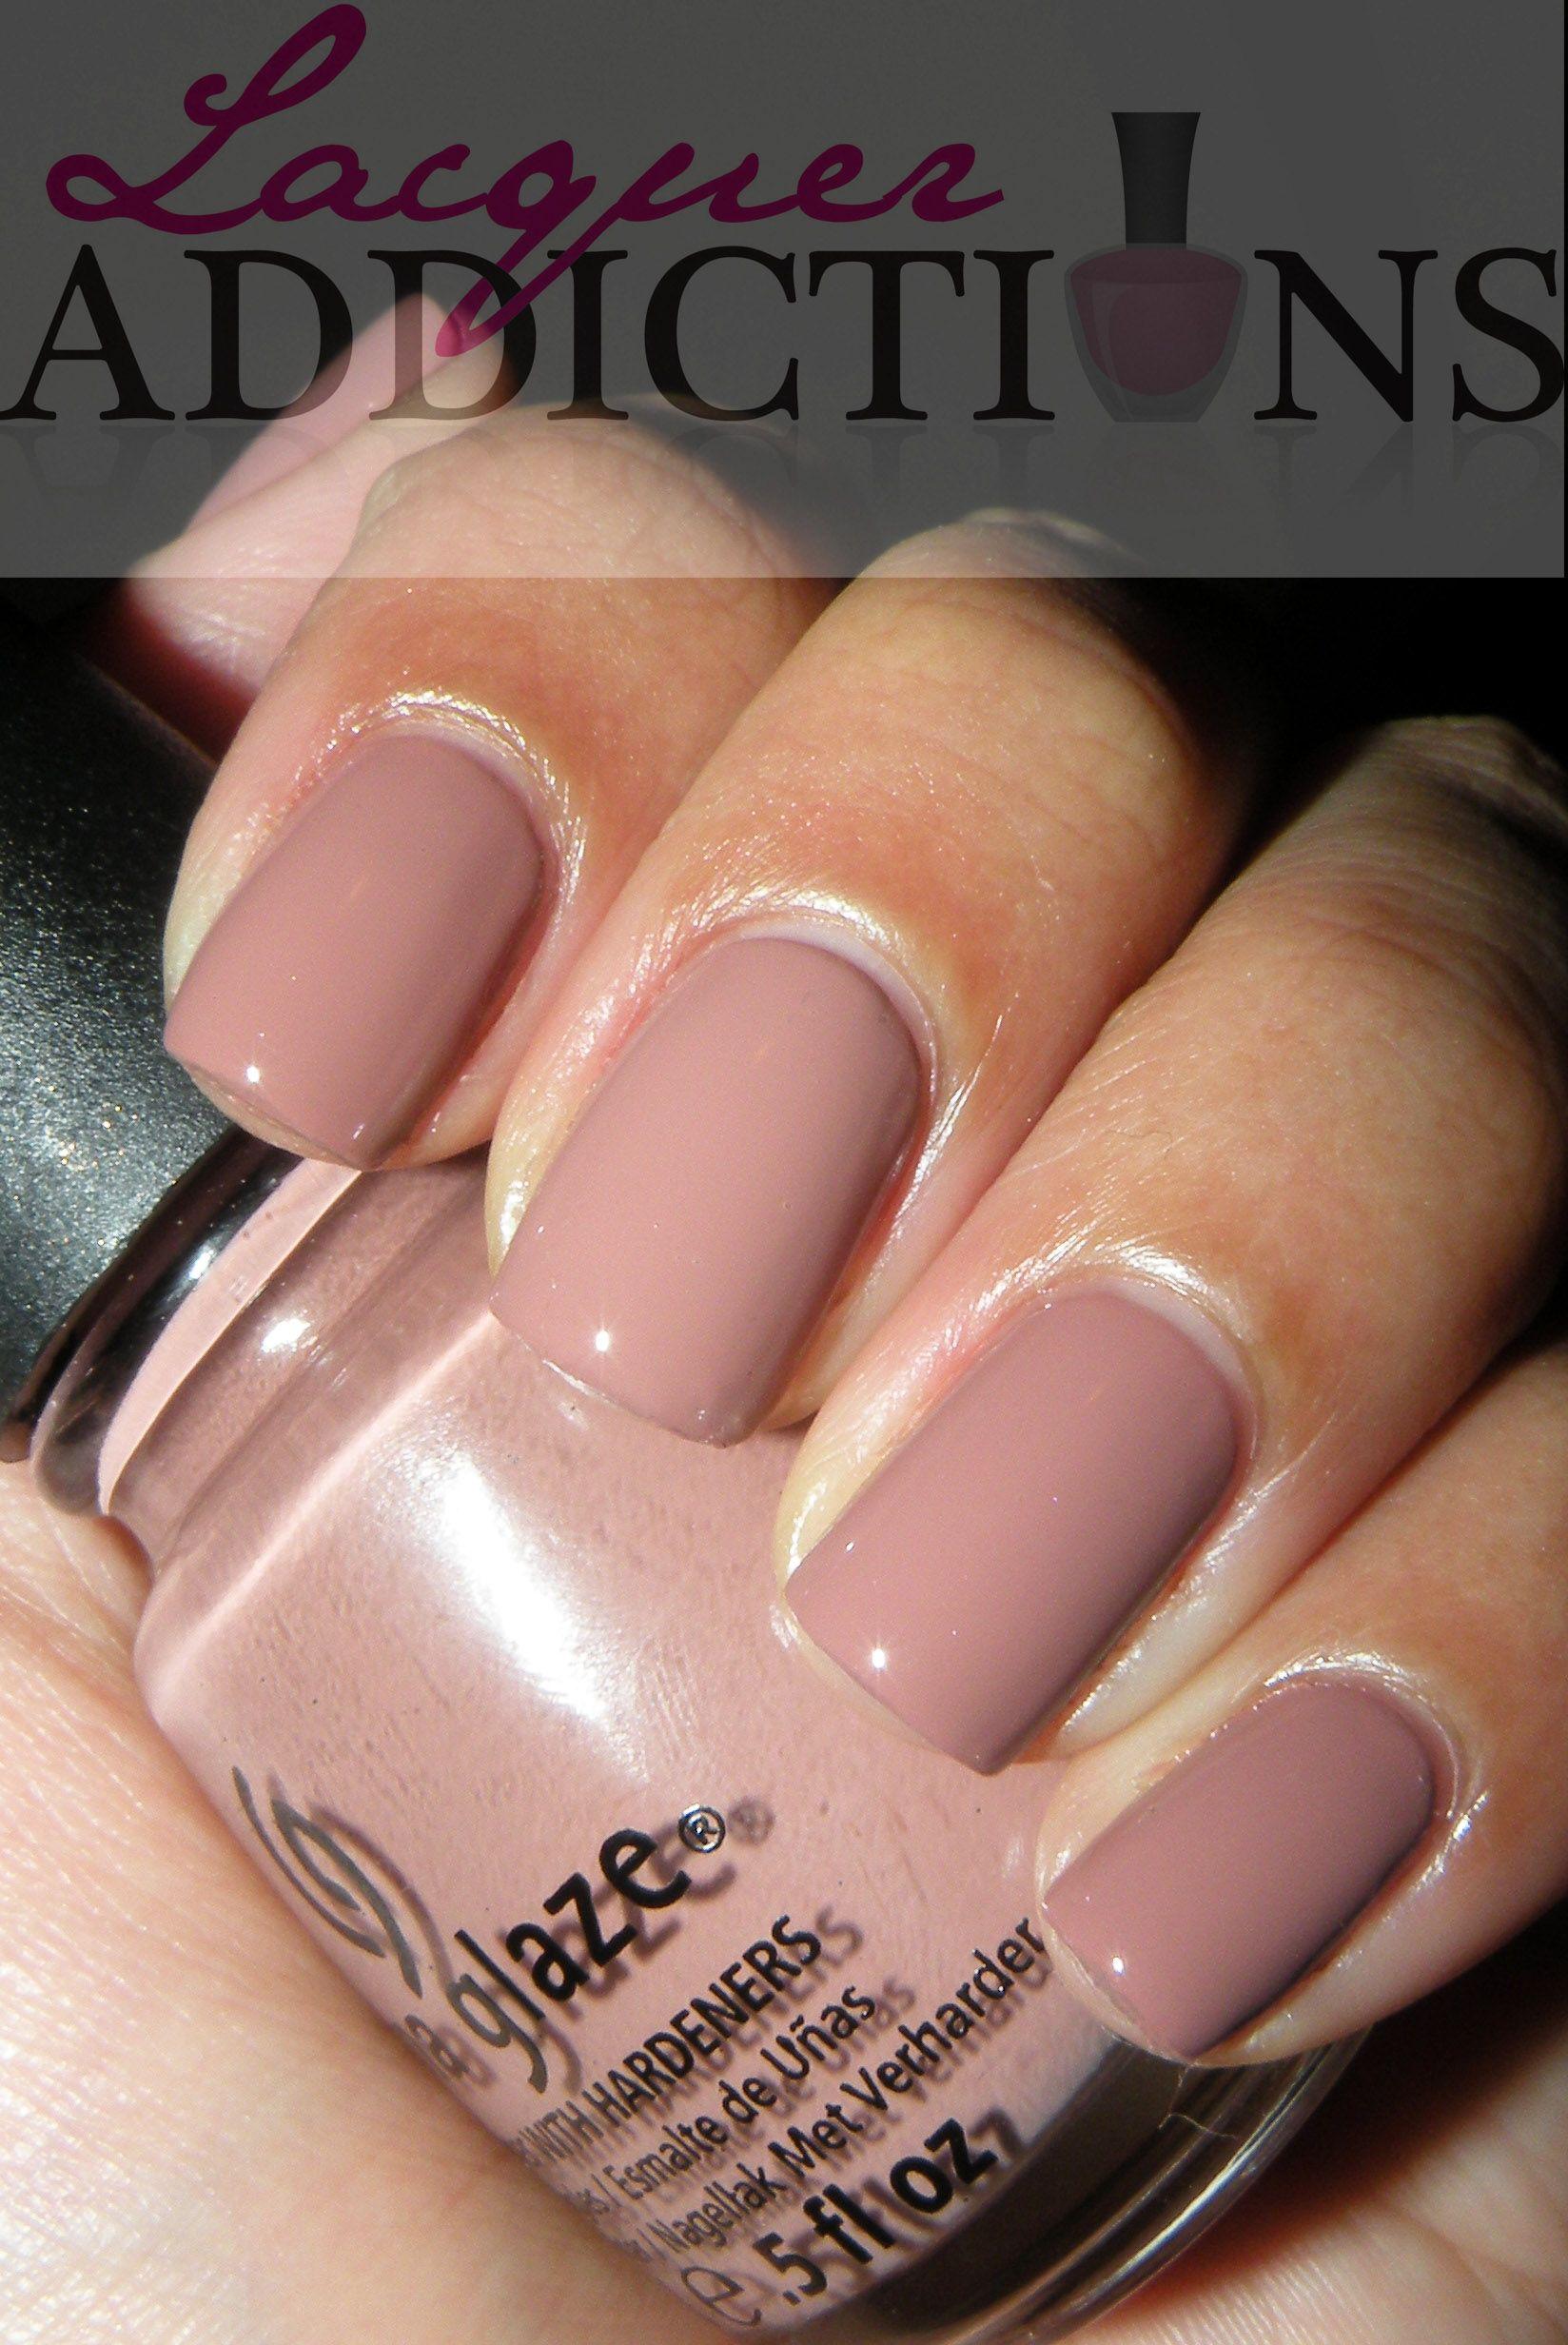 Dress Me Up- Hunger Games China Glaze | Nagelkunst, Nails und Kosmetik